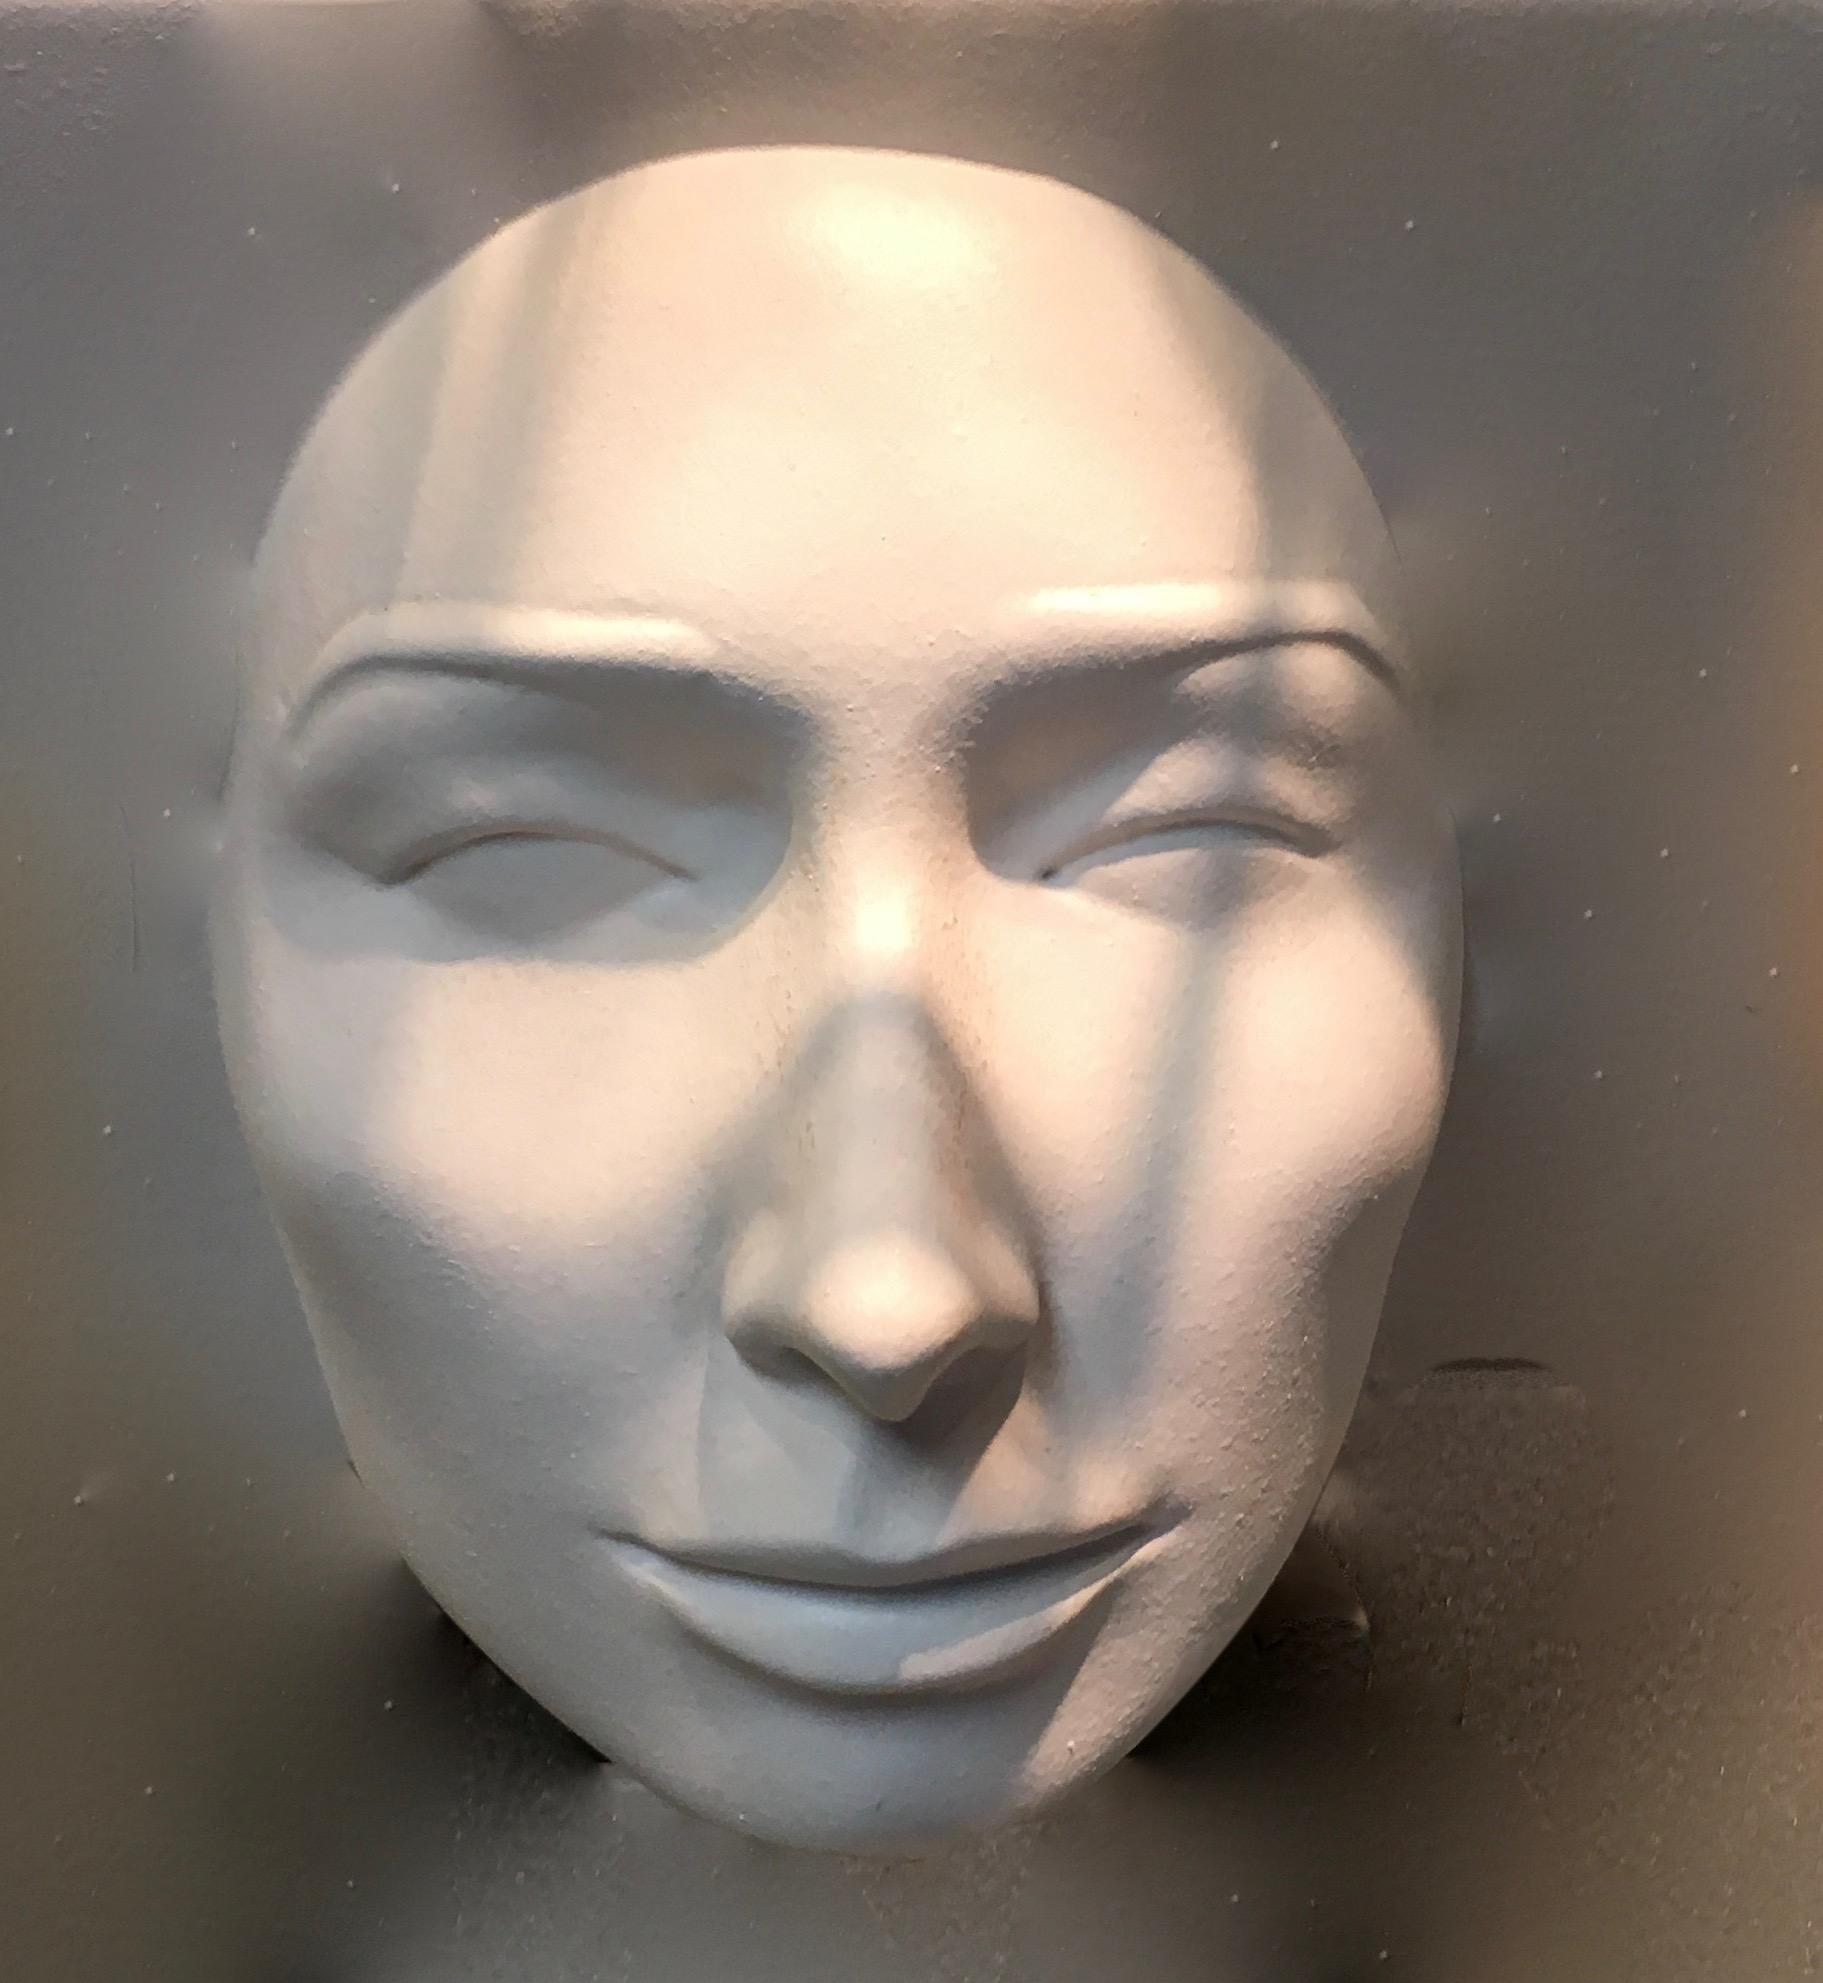 Shadows cast upon face